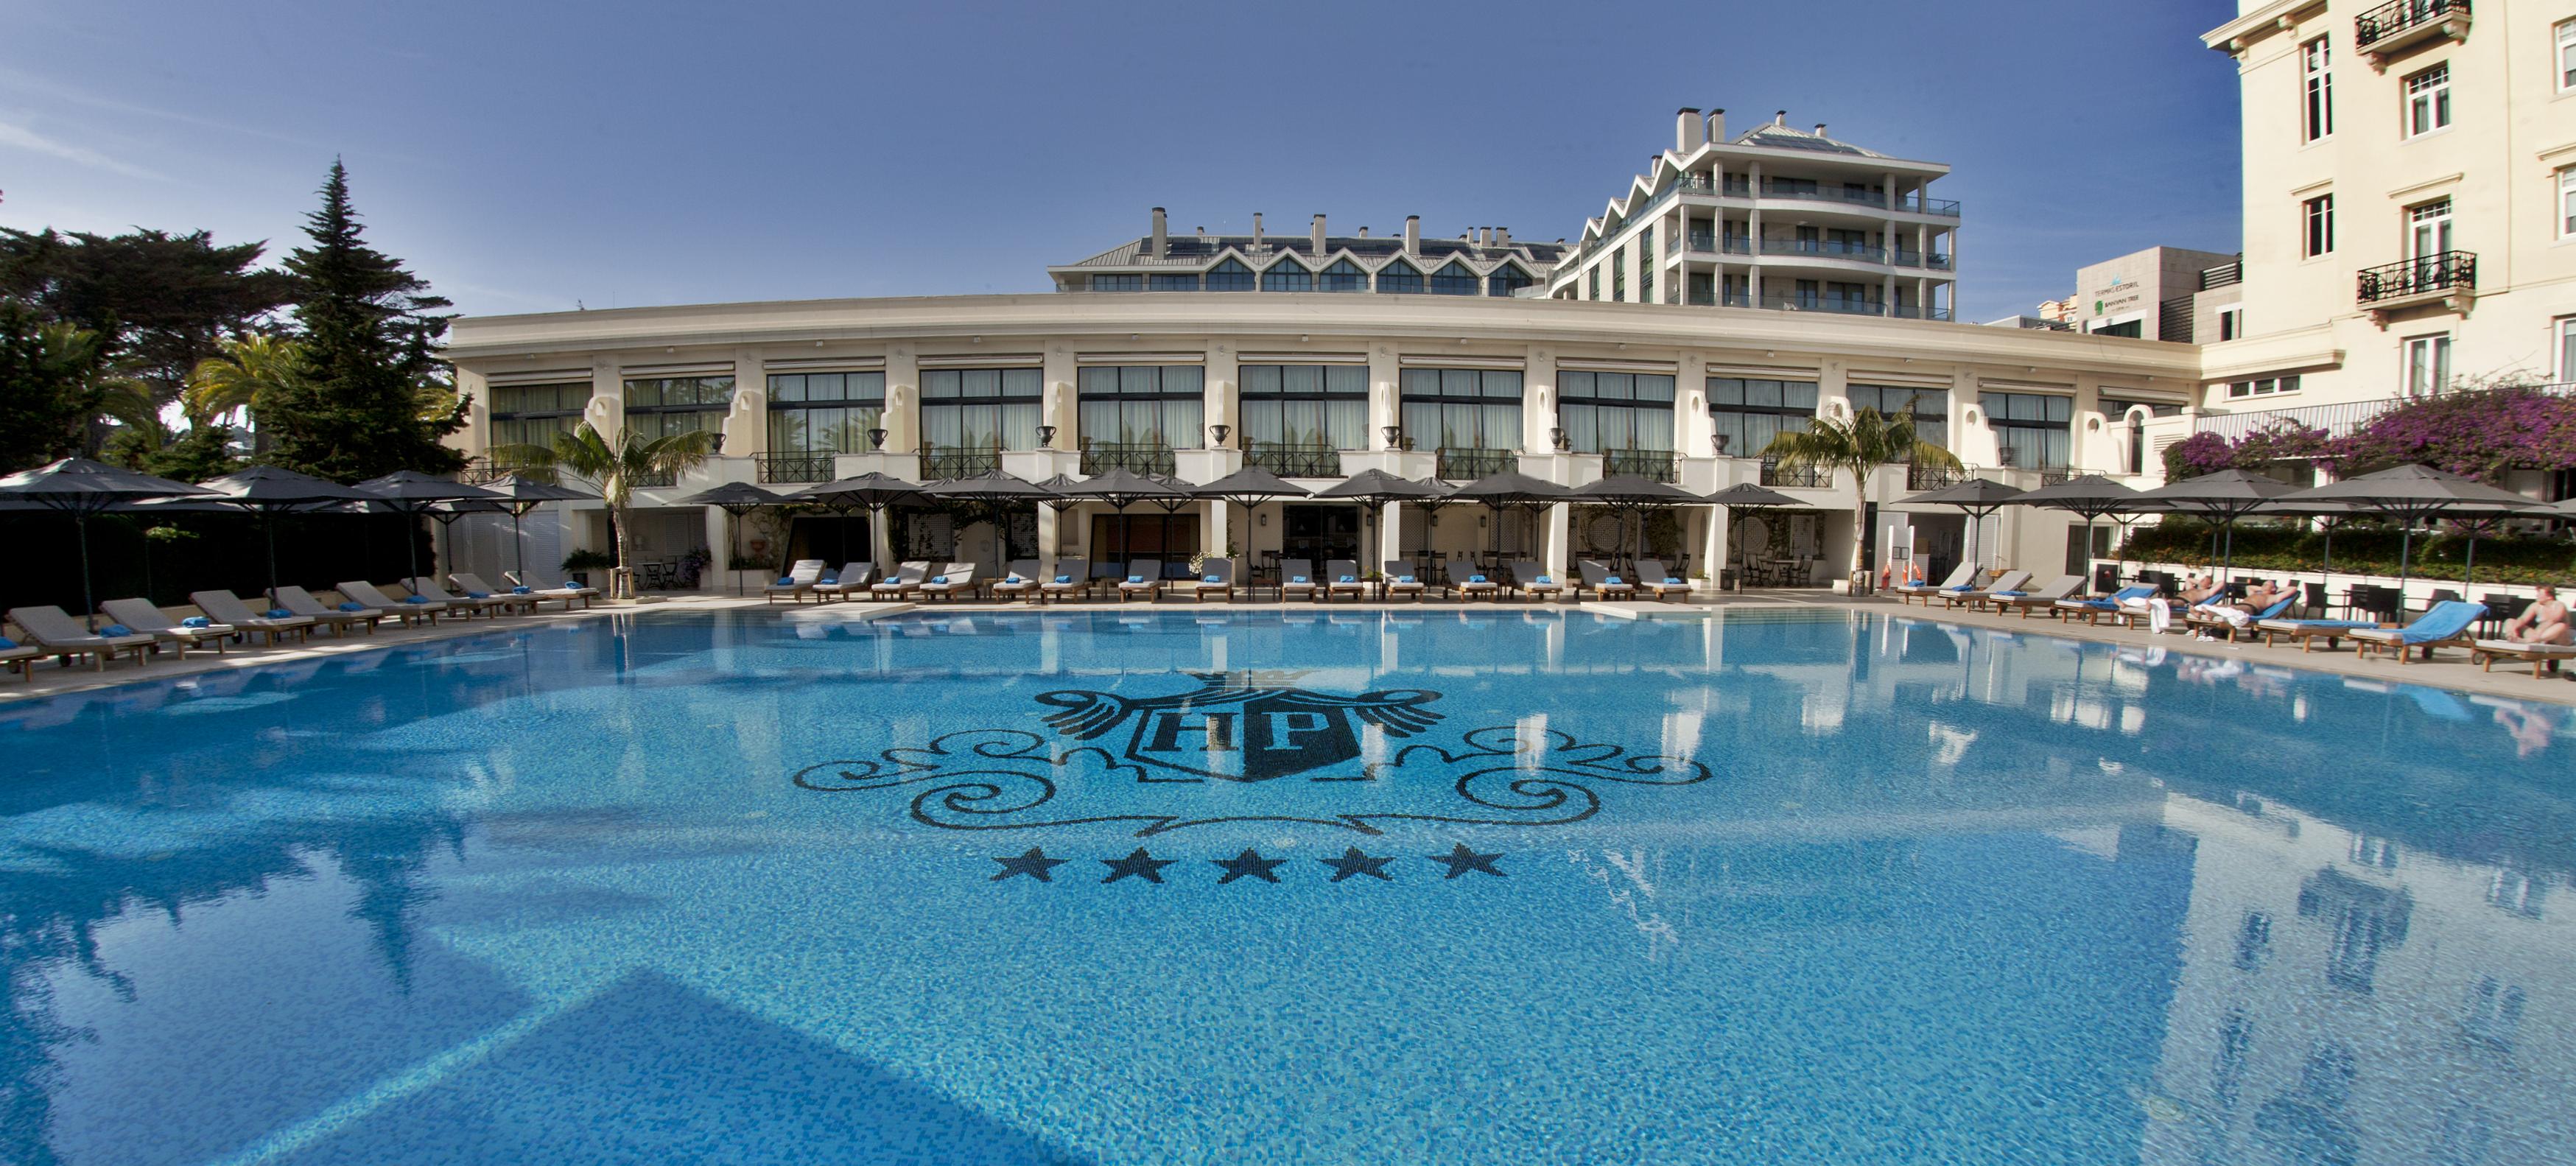 palacio-estoril-swimming-pool